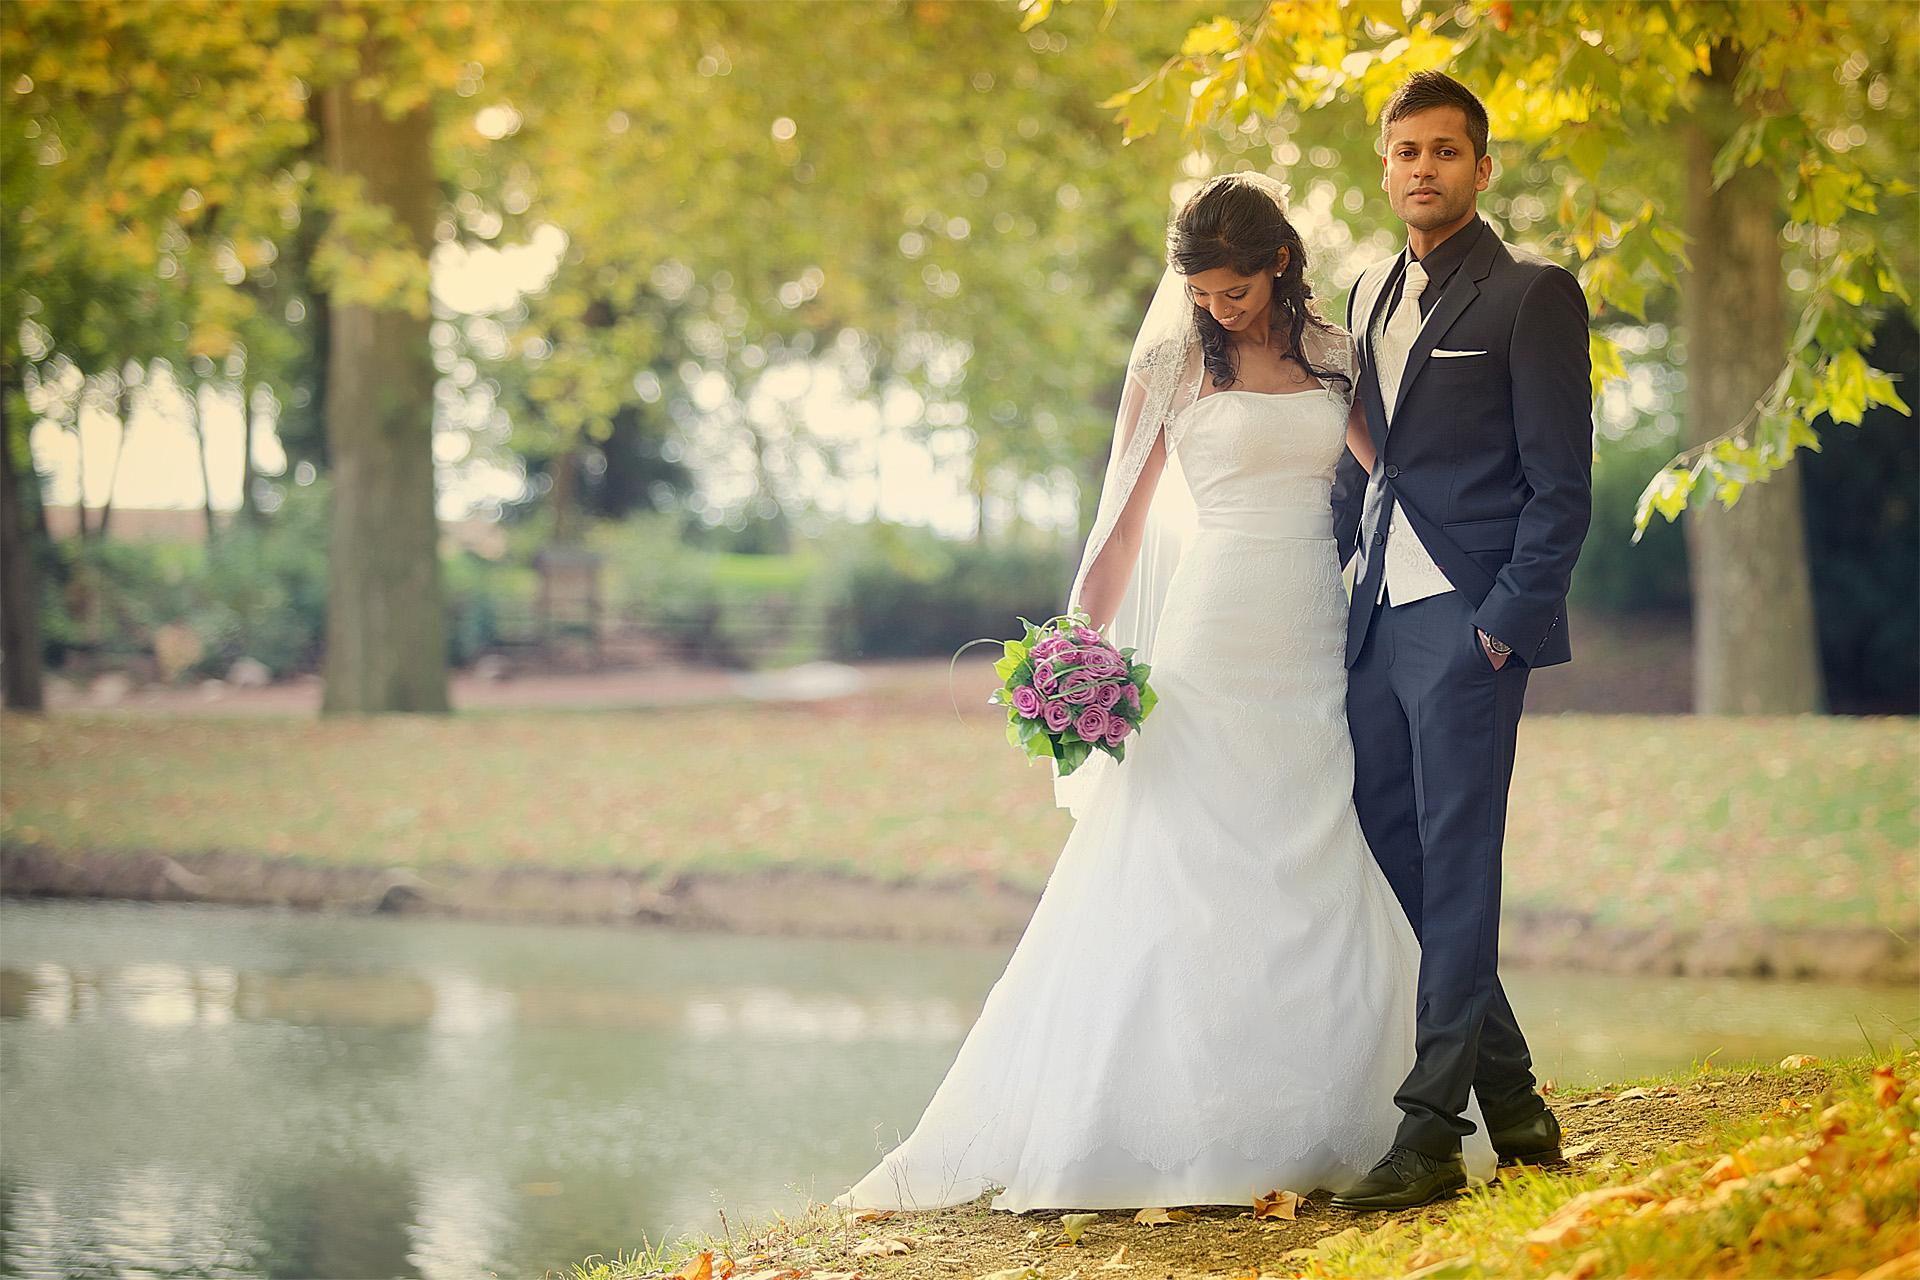 Hochzeitsfilm Hochzeitsvideo Kln Hochzeitsvideograf